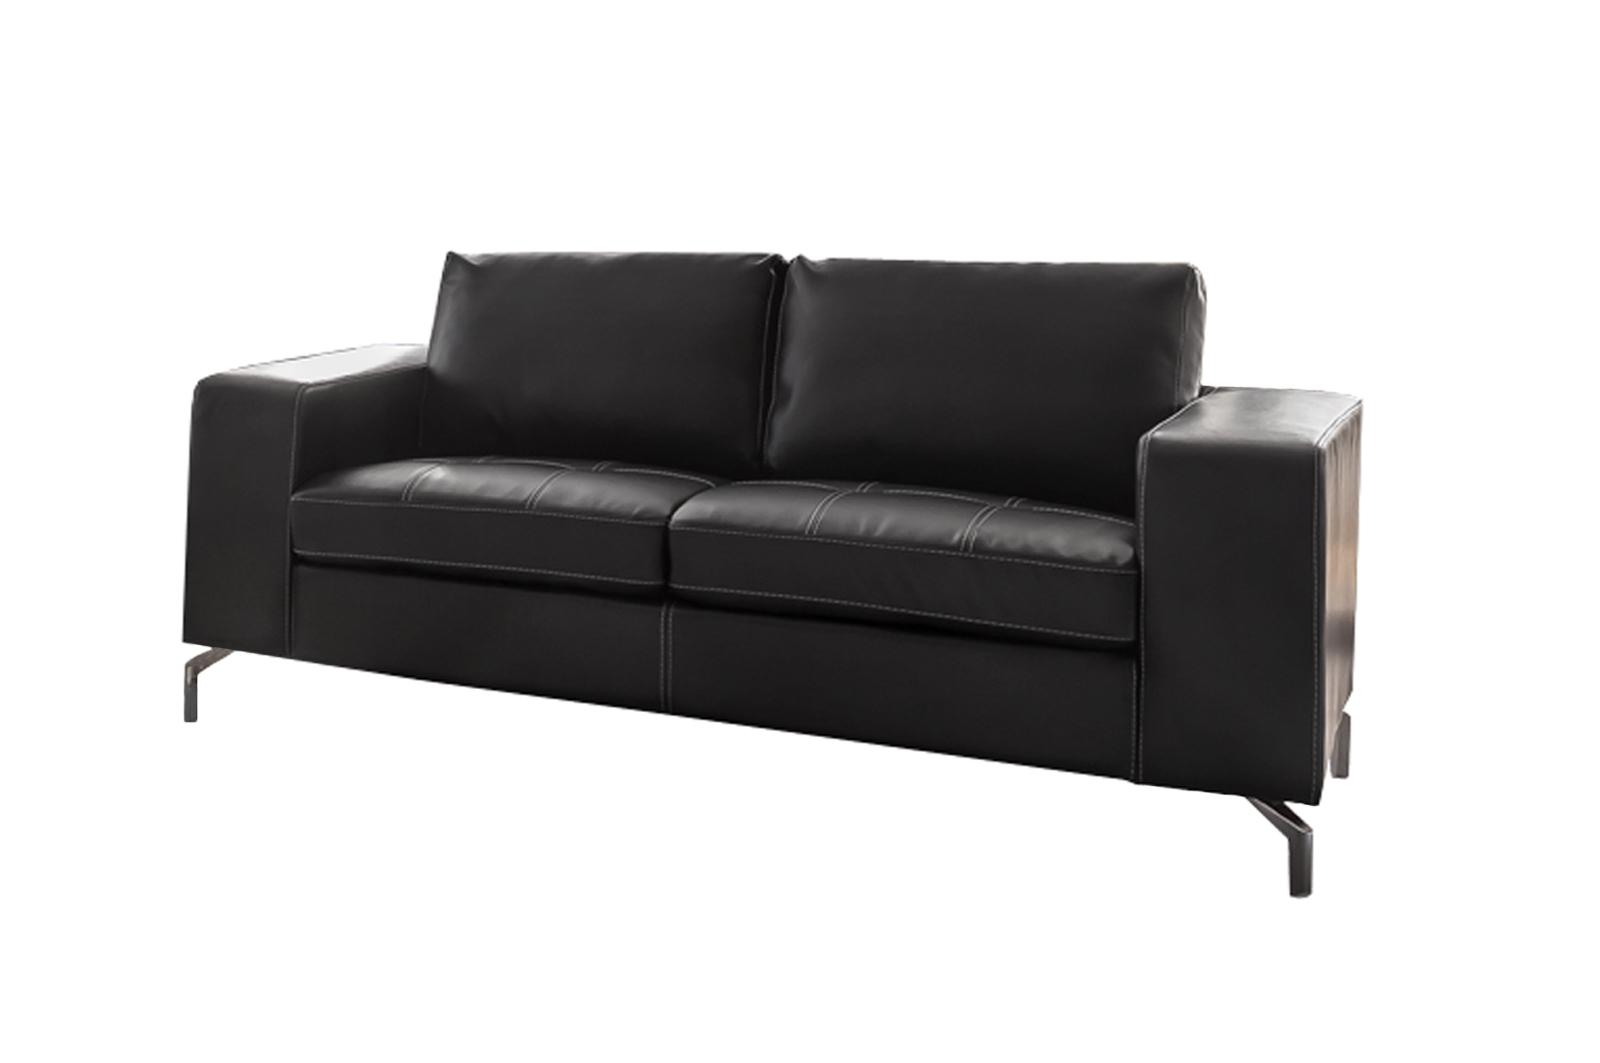 Sale Couch 2 Sitzer Sofa Dunkelgrau Belair Günstig